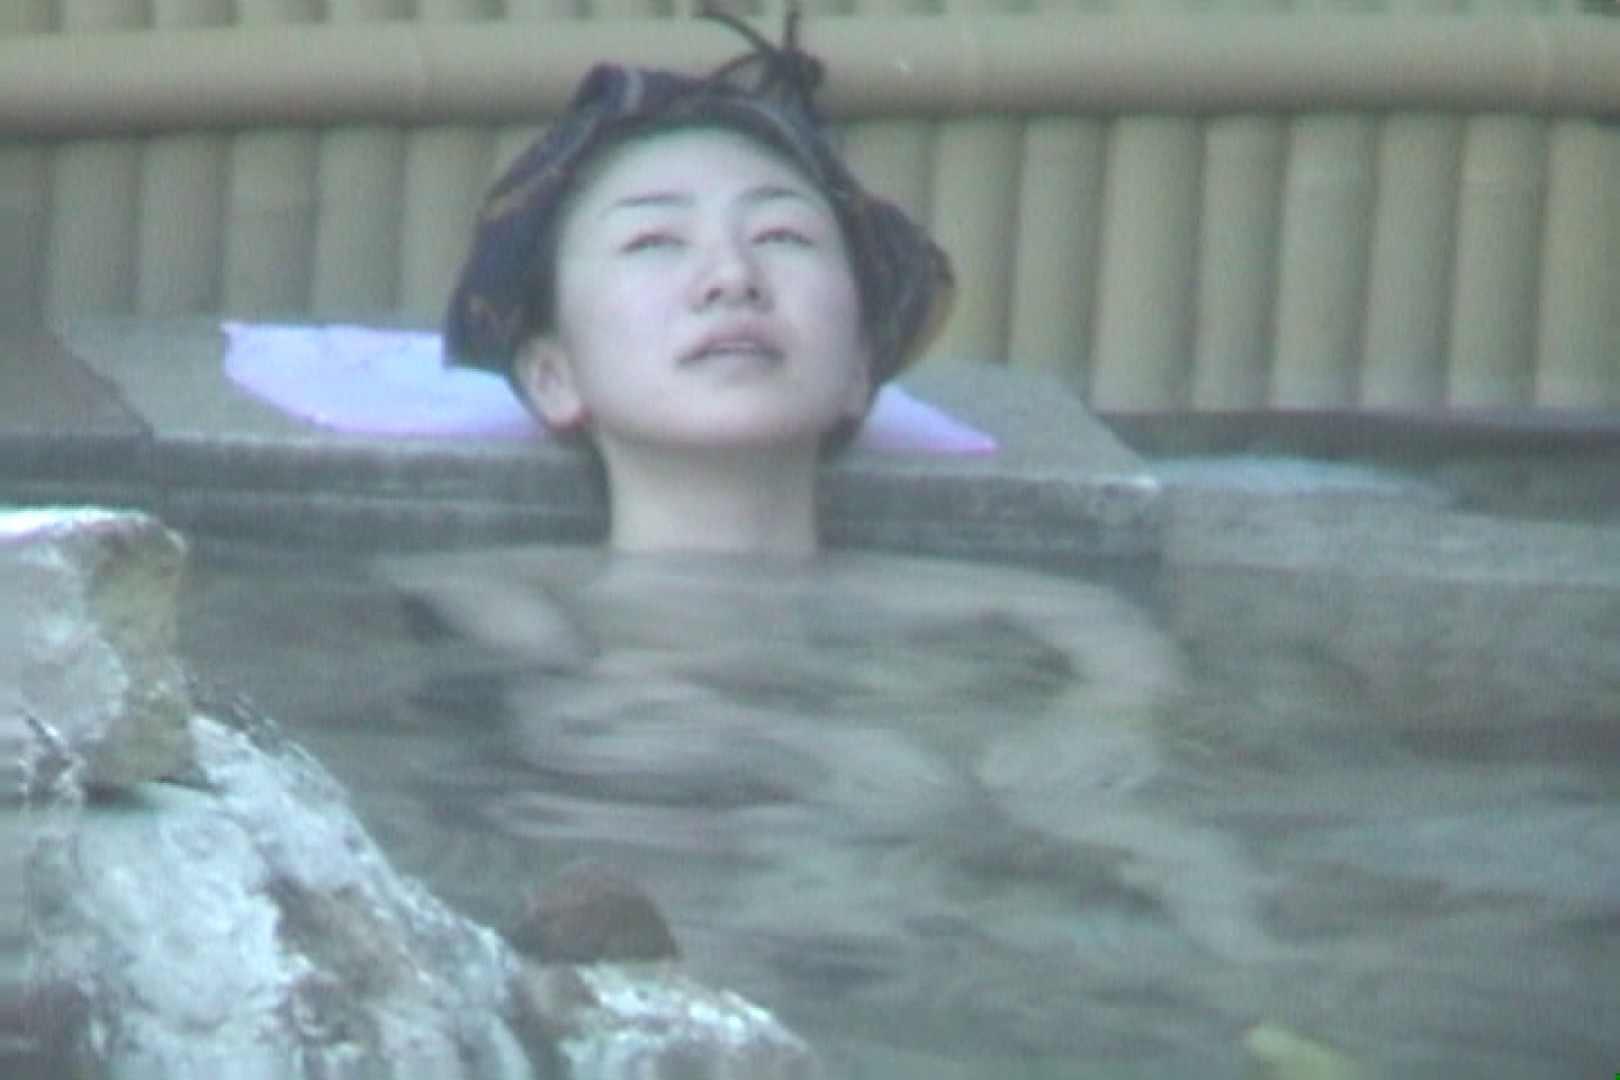 Aquaな露天風呂Vol.607 盗撮シリーズ | 露天風呂編  107PIX 89